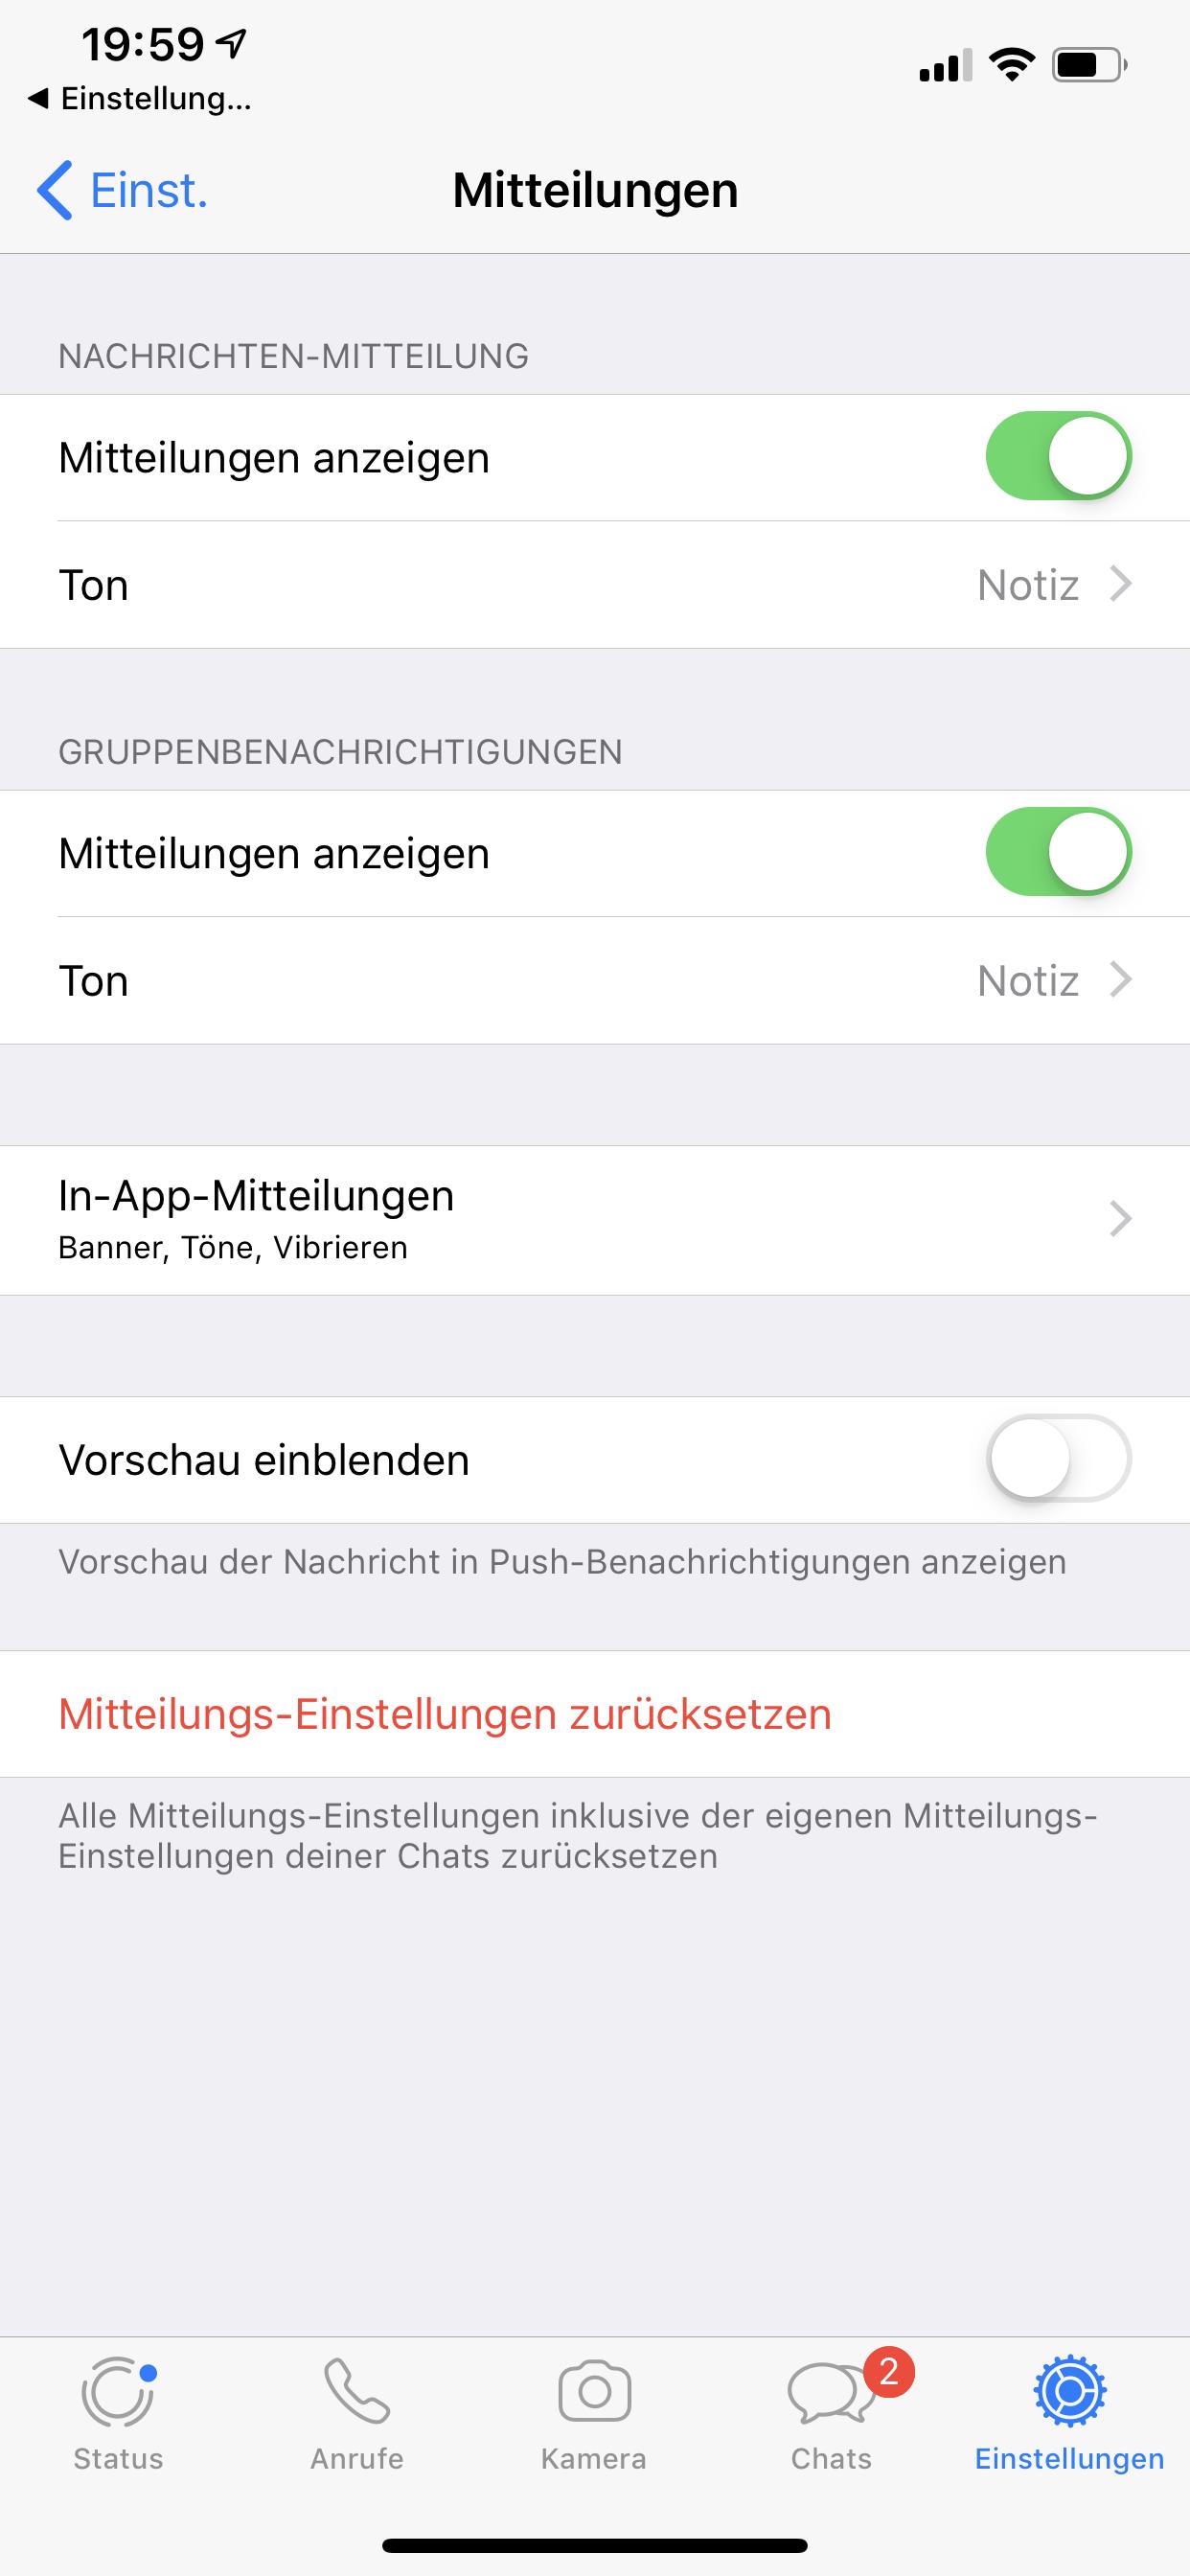 Ausblenden whatsapp ios anderer profilbild WhatsApp Status